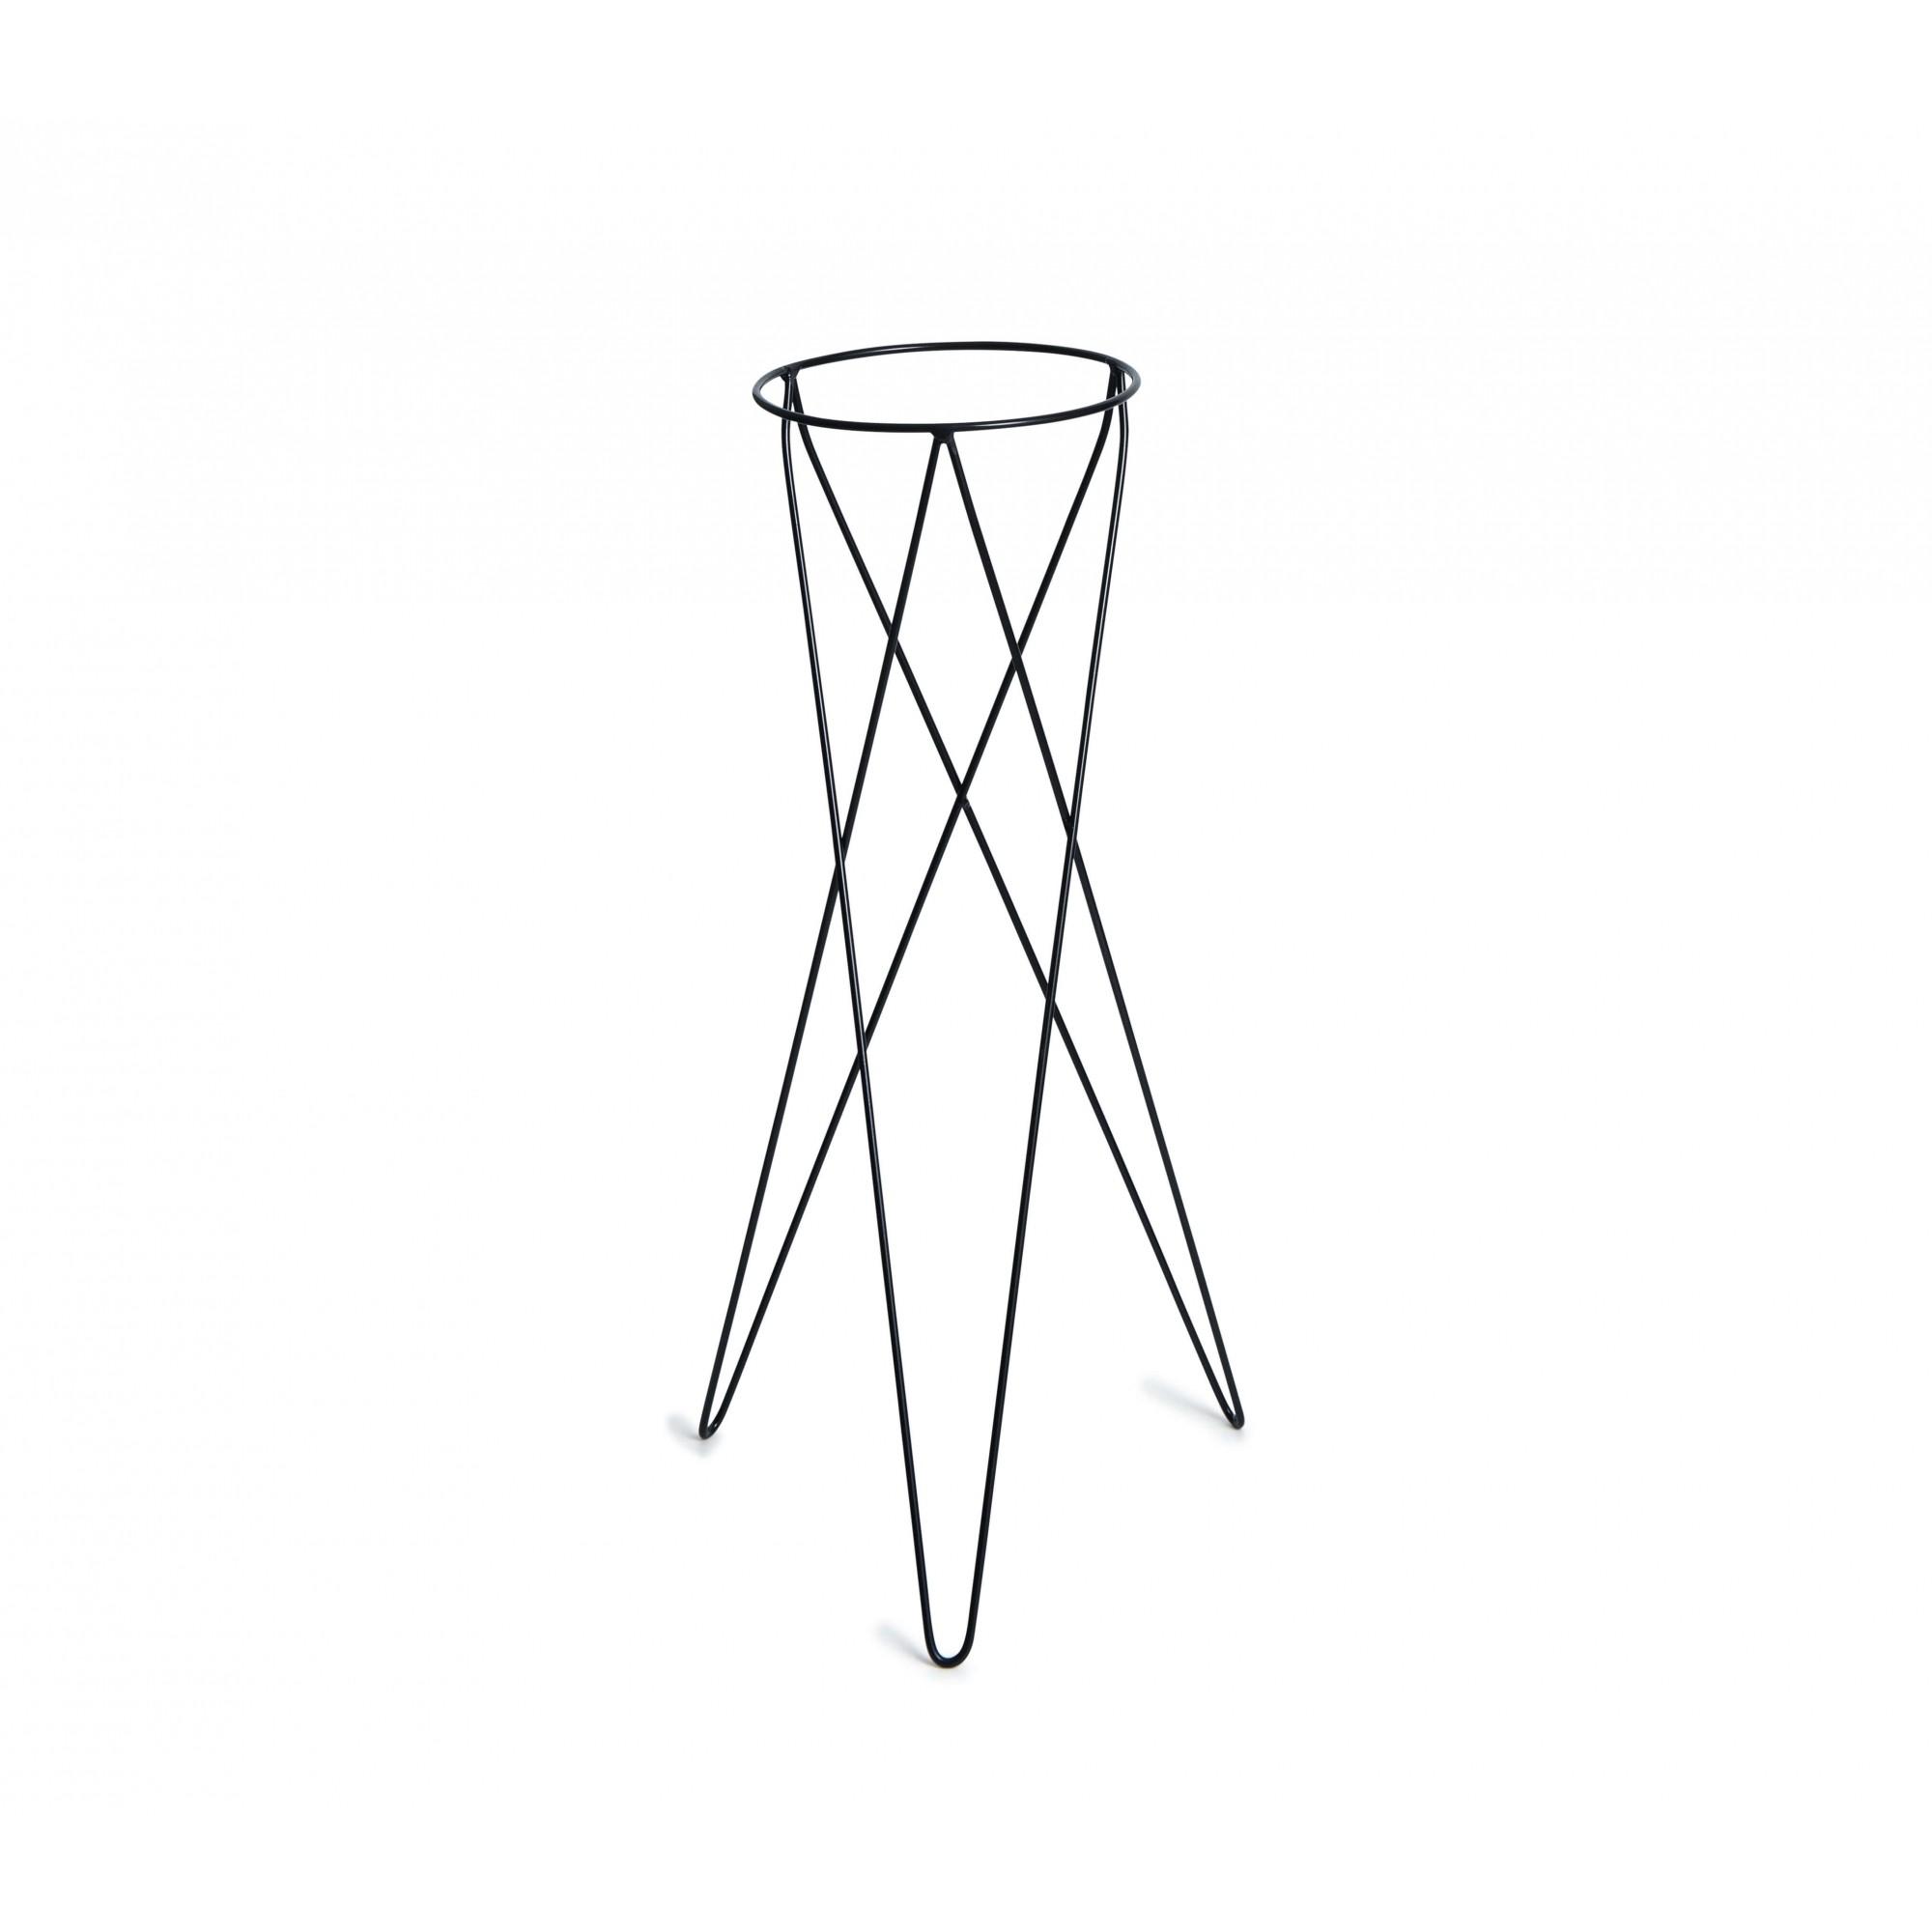 Suporte Tripé Metálico Preto 80cm para Vaso Autoirrigável Grande N04  - Loja Raiz